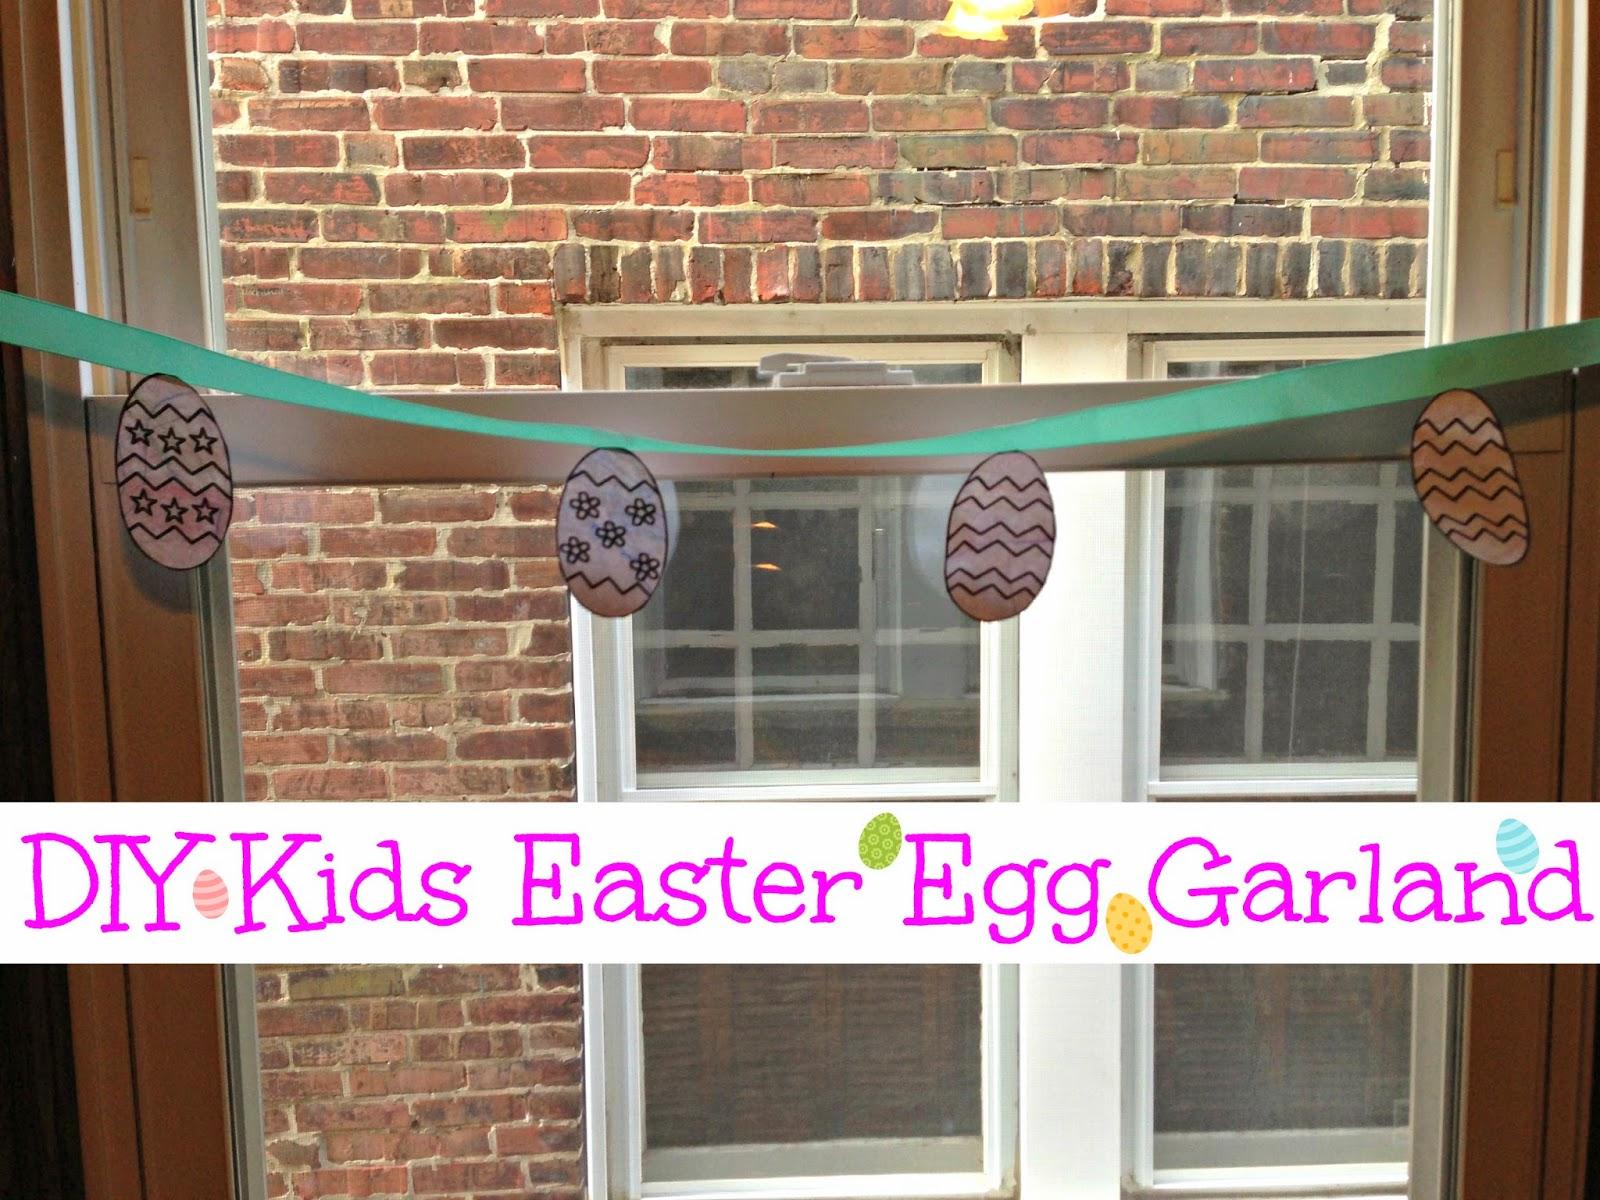 Easy Easter garland for kids to make! @blogginginpa